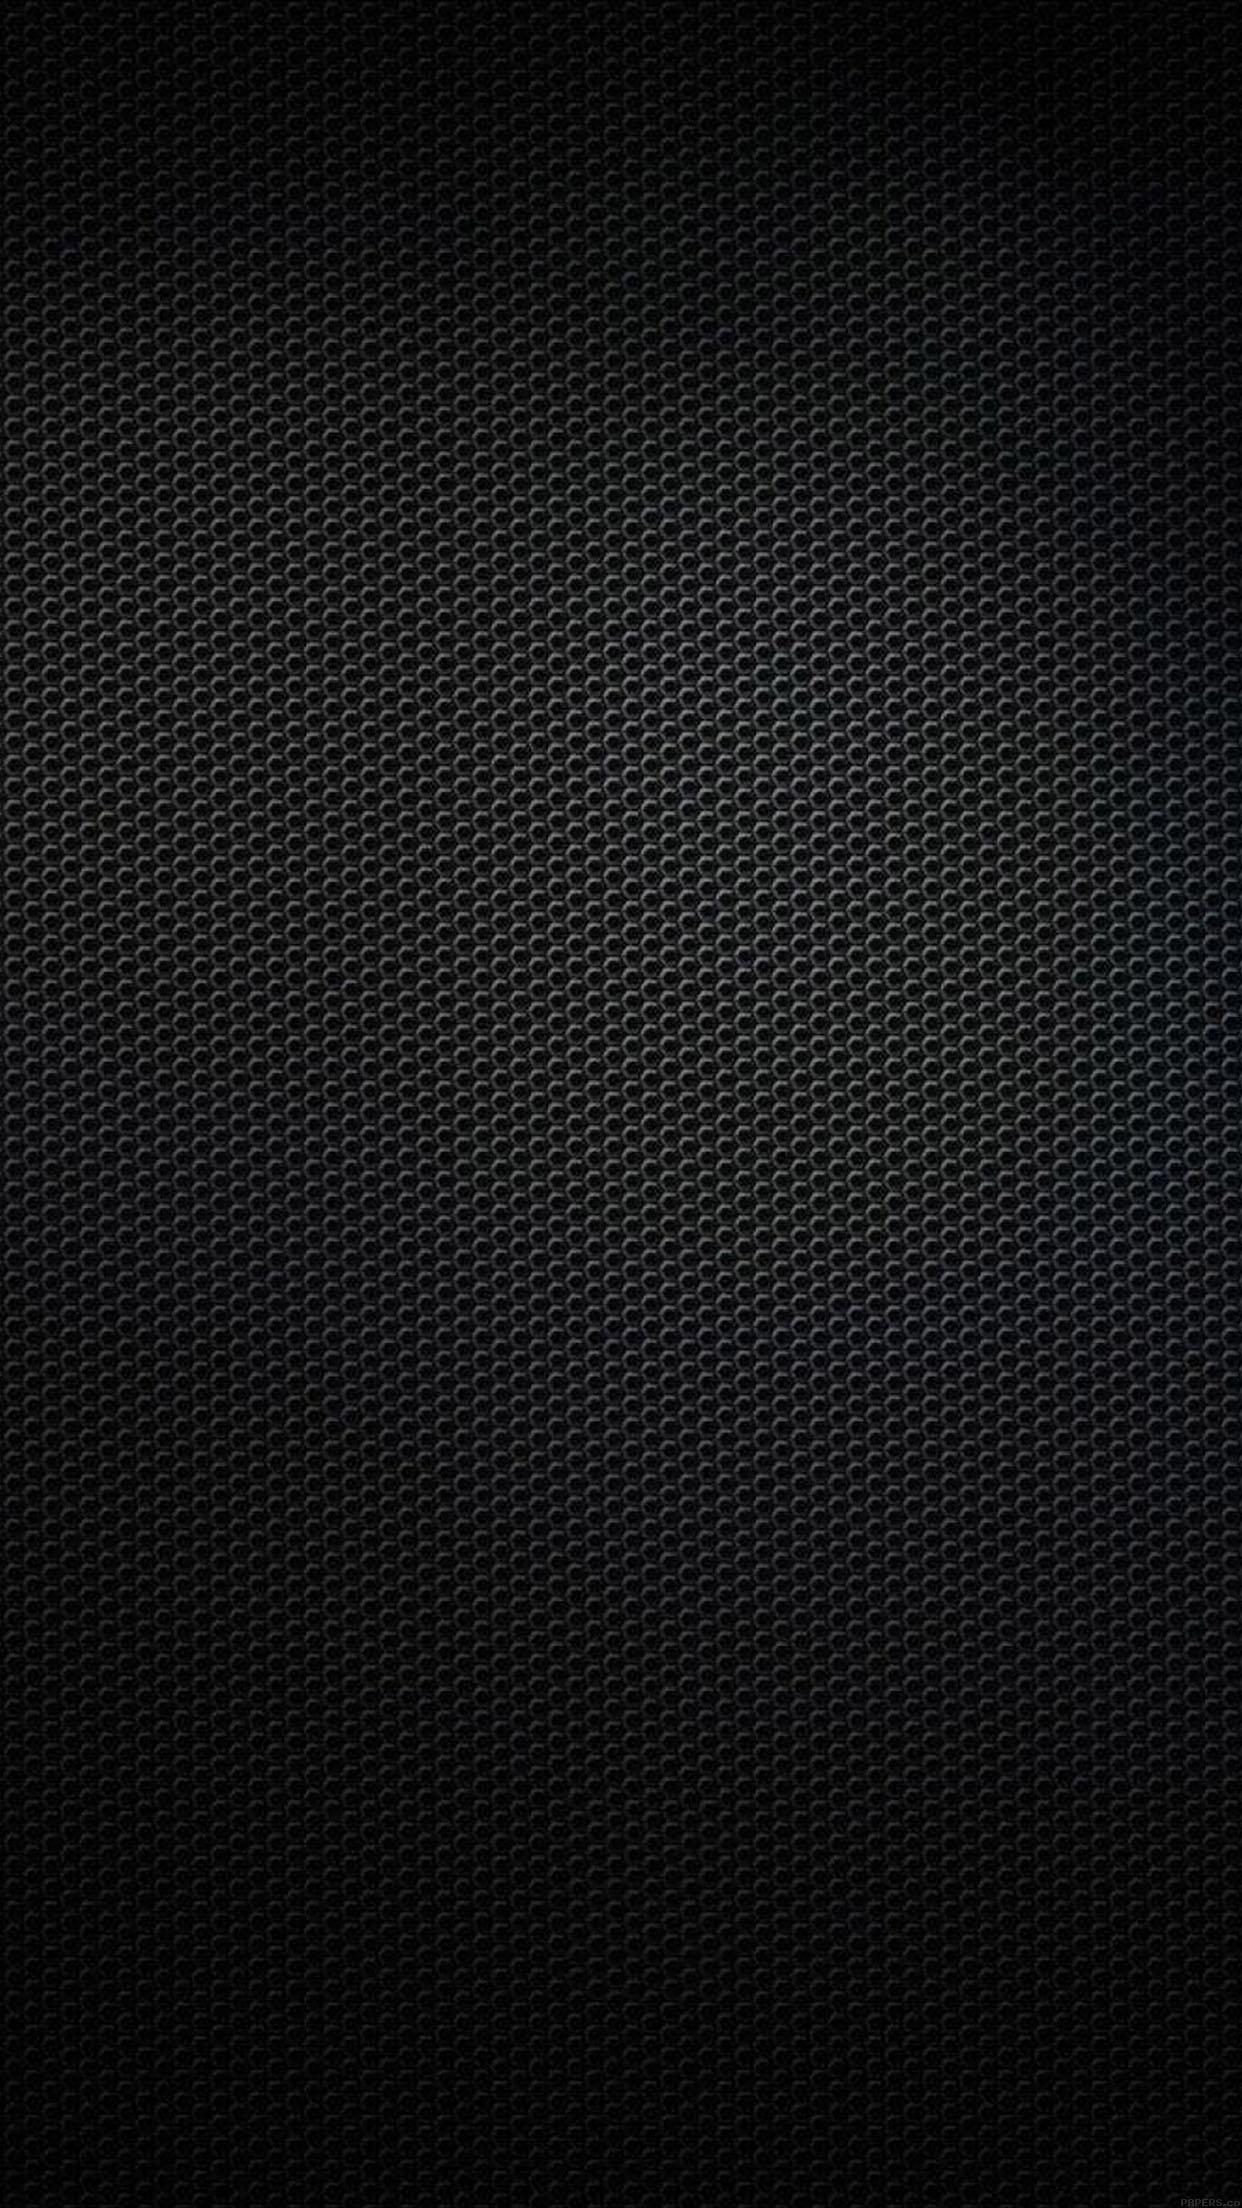 Tribal Wallpaper 3d Black Iphone Wallpaper Pixelstalk Net